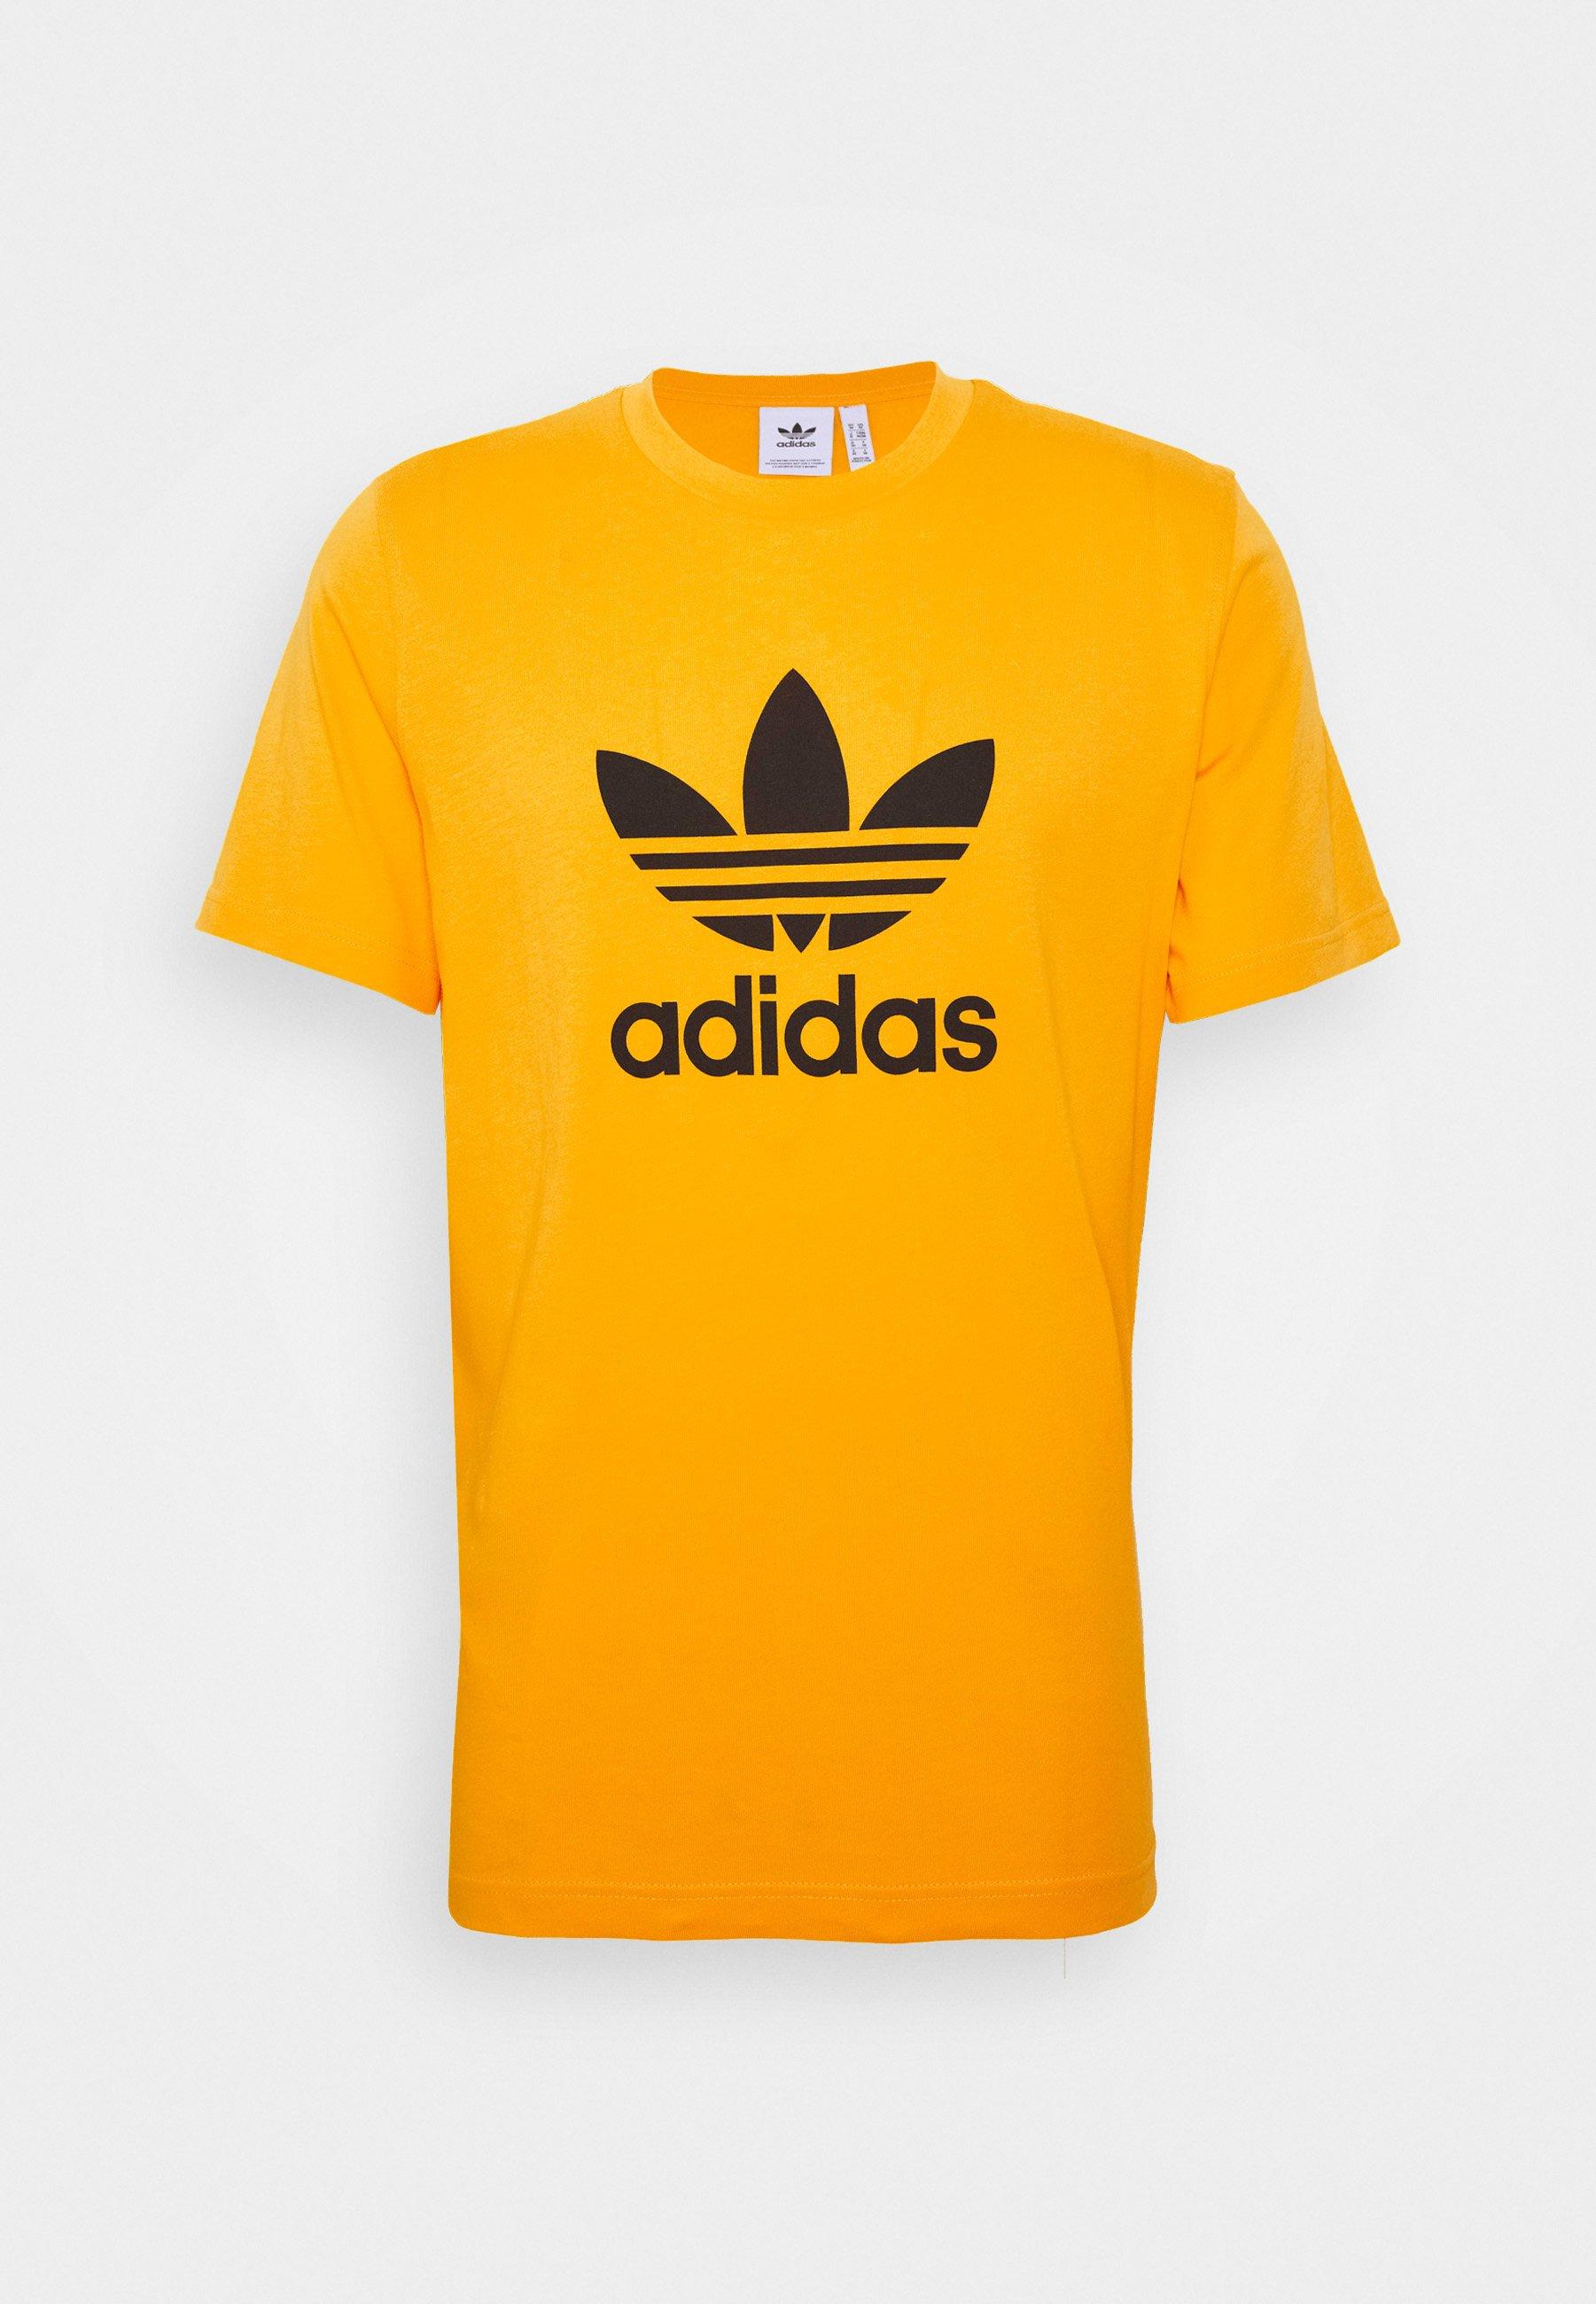 adidas Originals TREFOIL T shirt imprimé actgol ZALANDO.FR